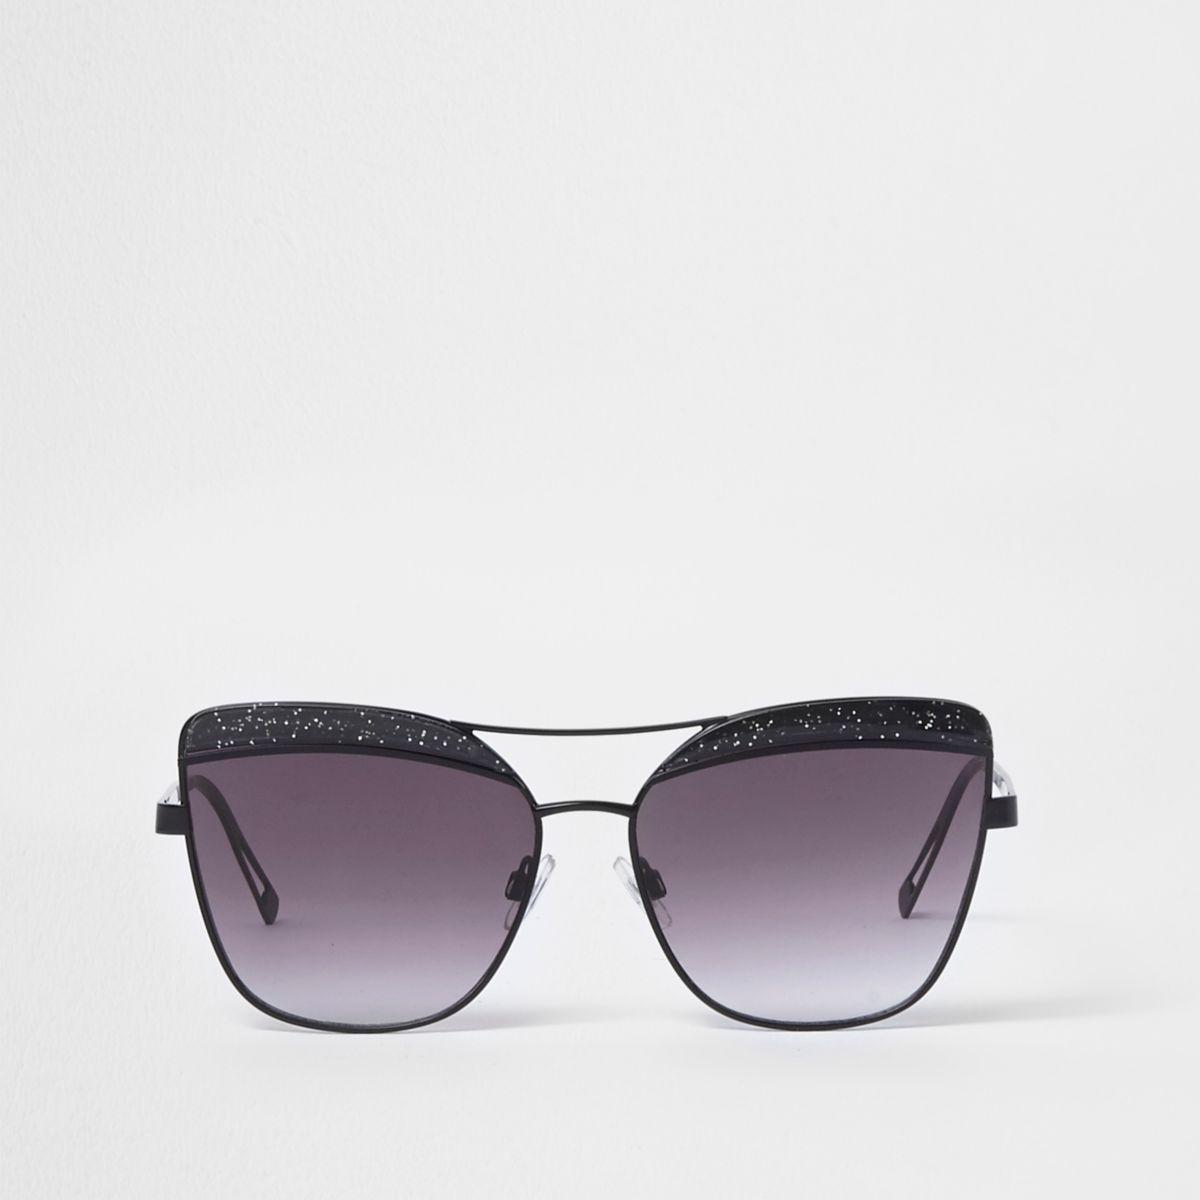 Zwarte cat eye-zonnebril met getinte glazen